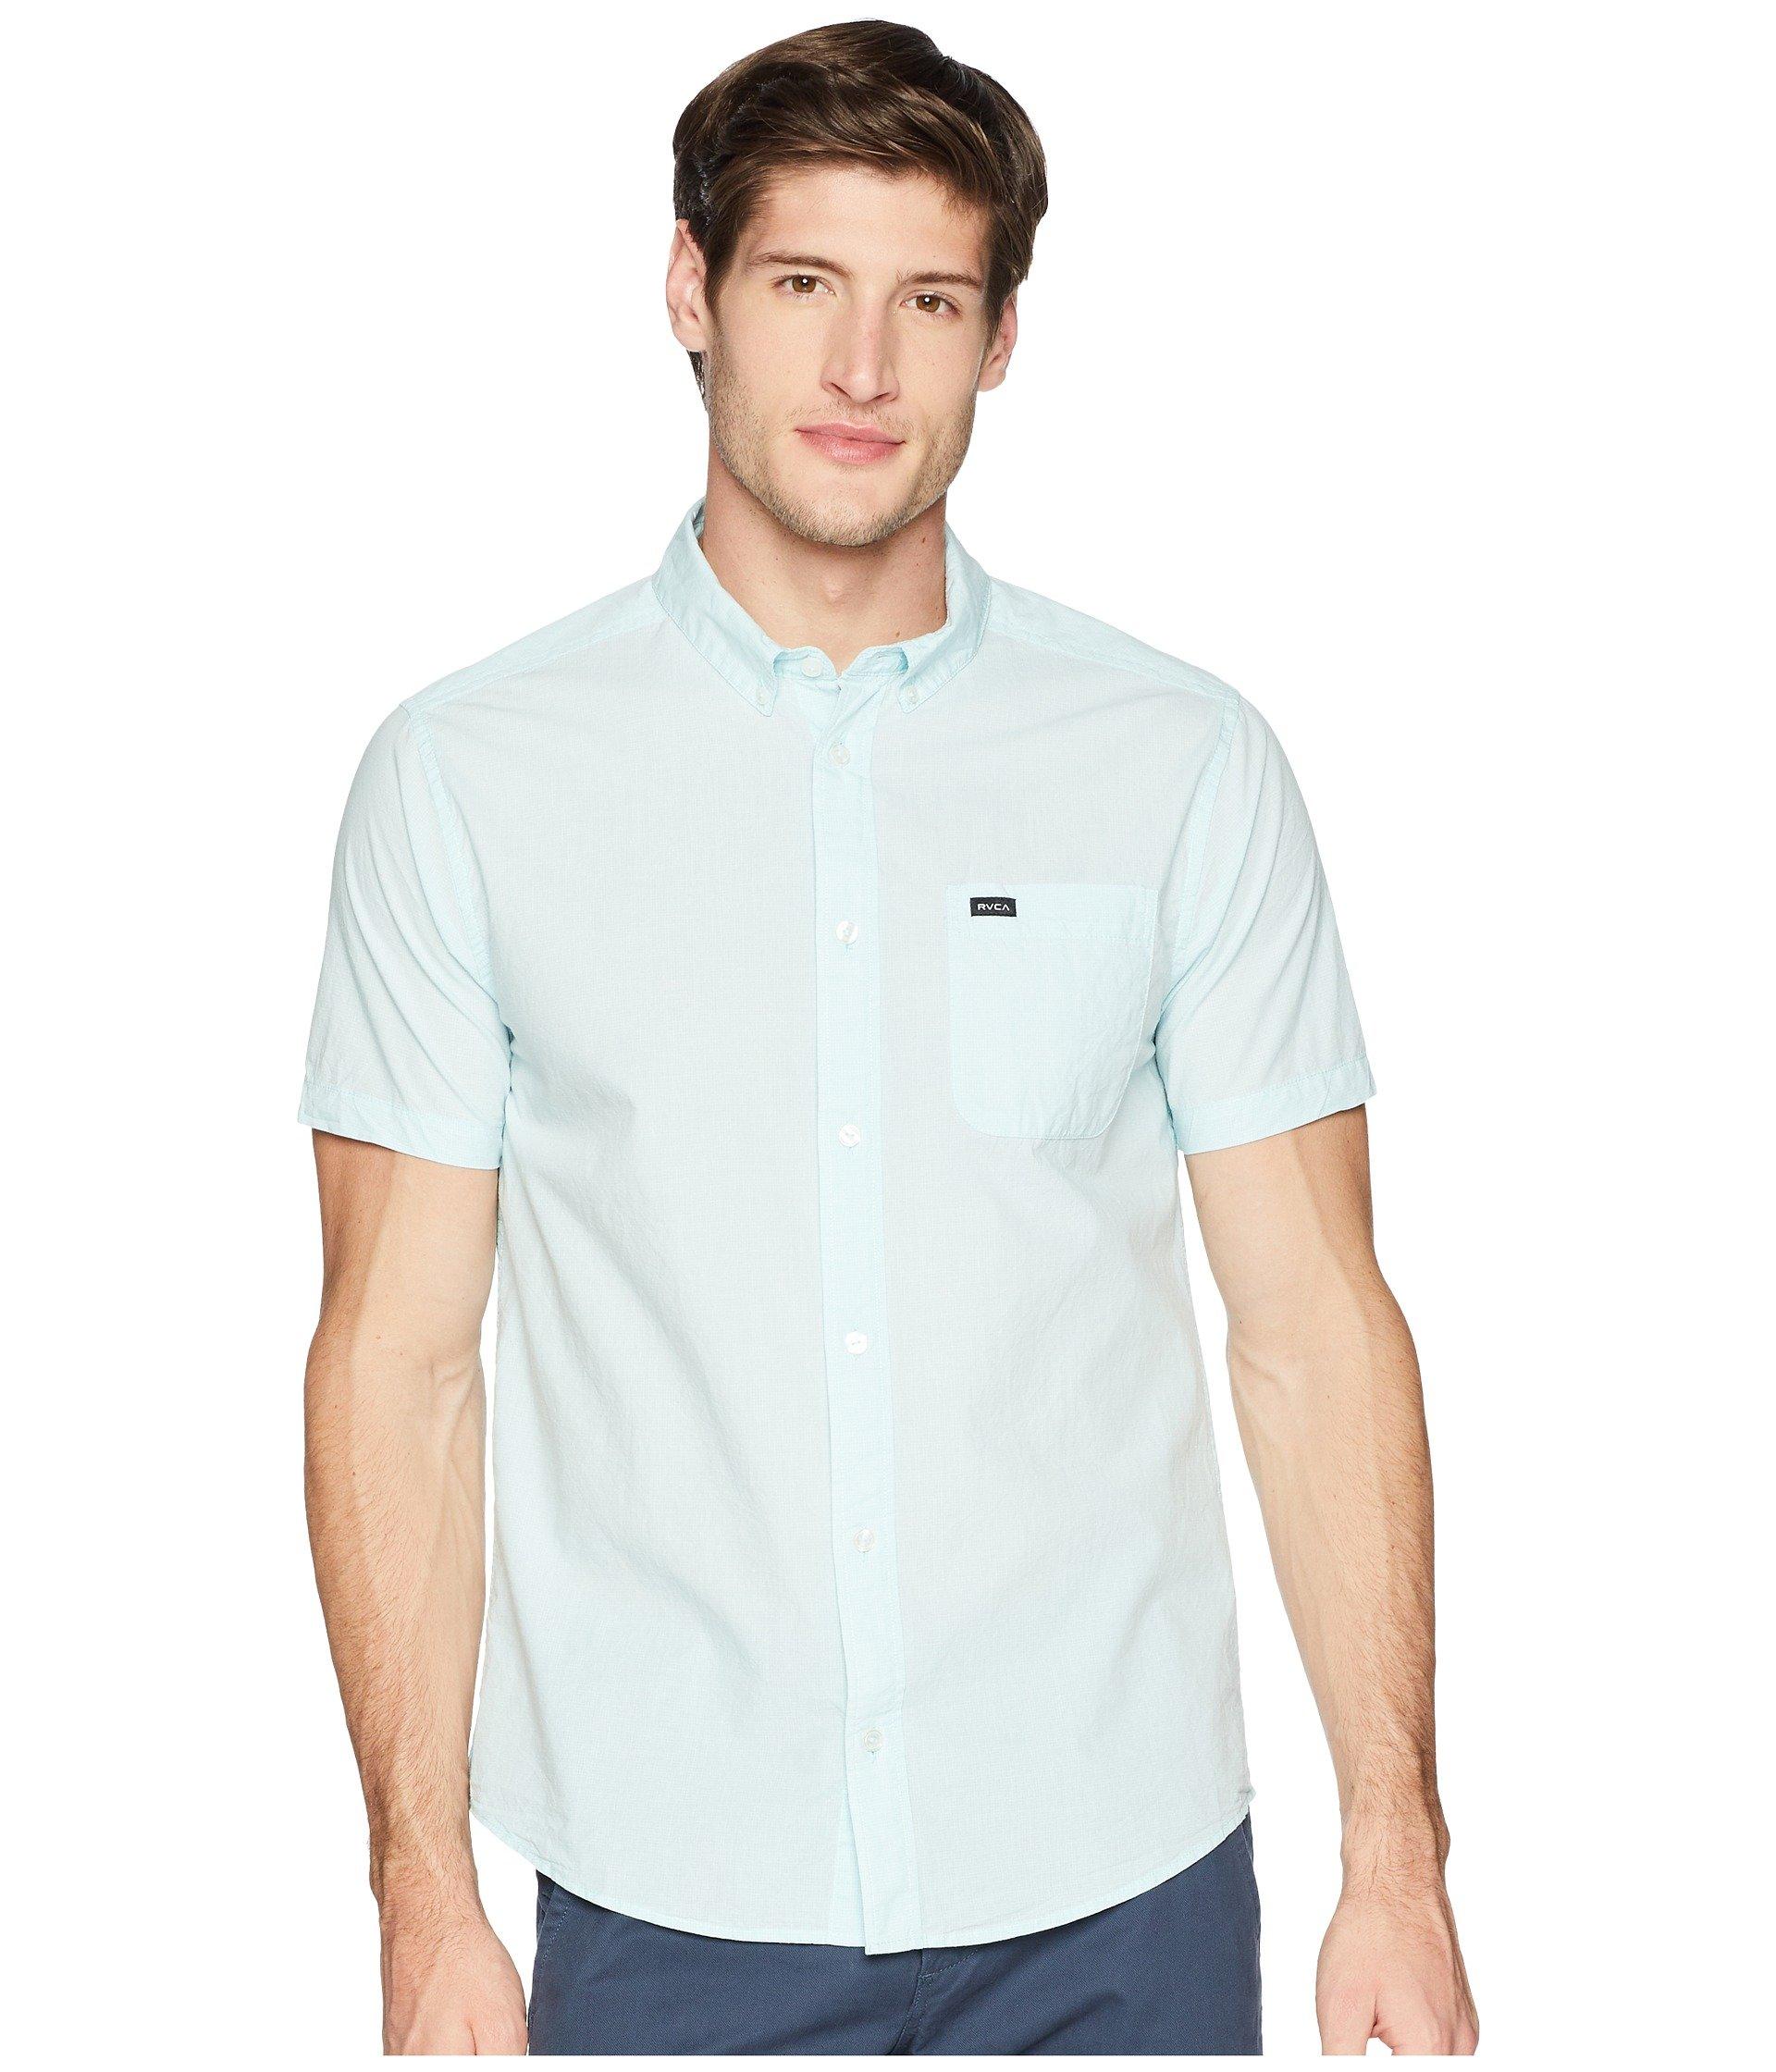 RVCA Men's Thatll Do Micro Short Sleeve Woven Shirt